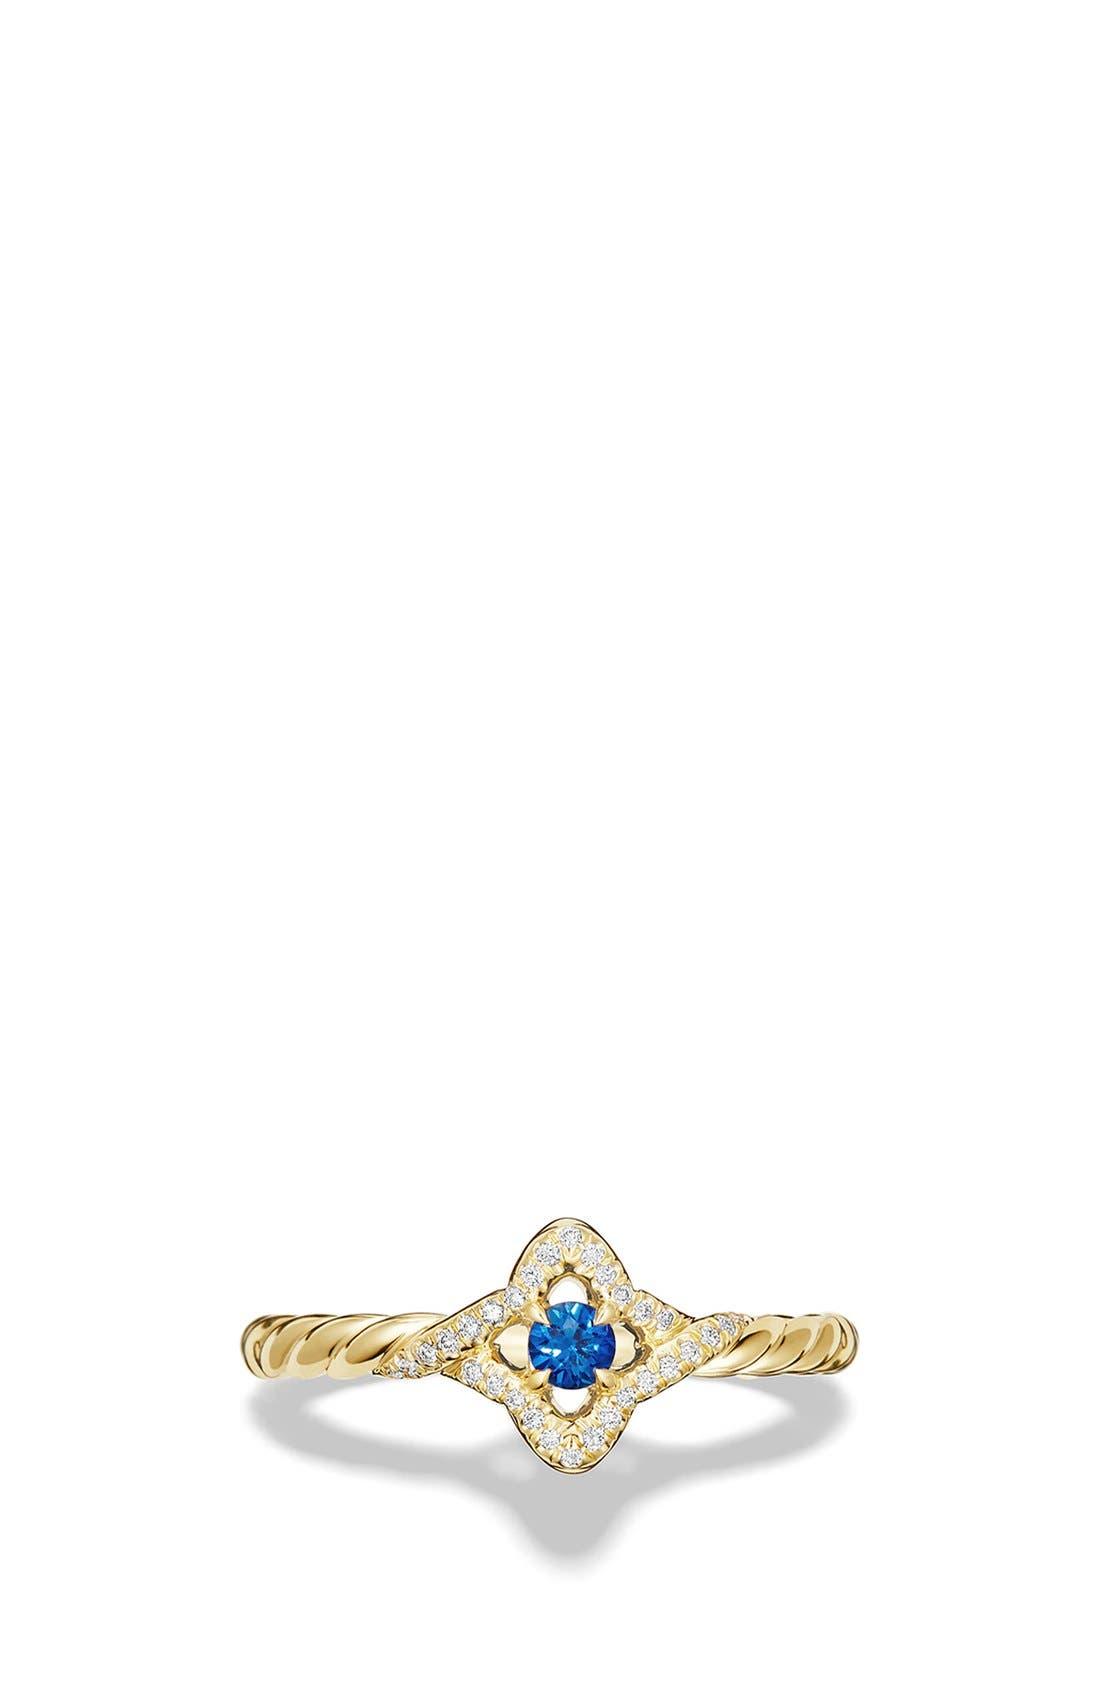 Alternate Image 3  - David Yurman 'Venetial Quatrefoil' Ring in Gold